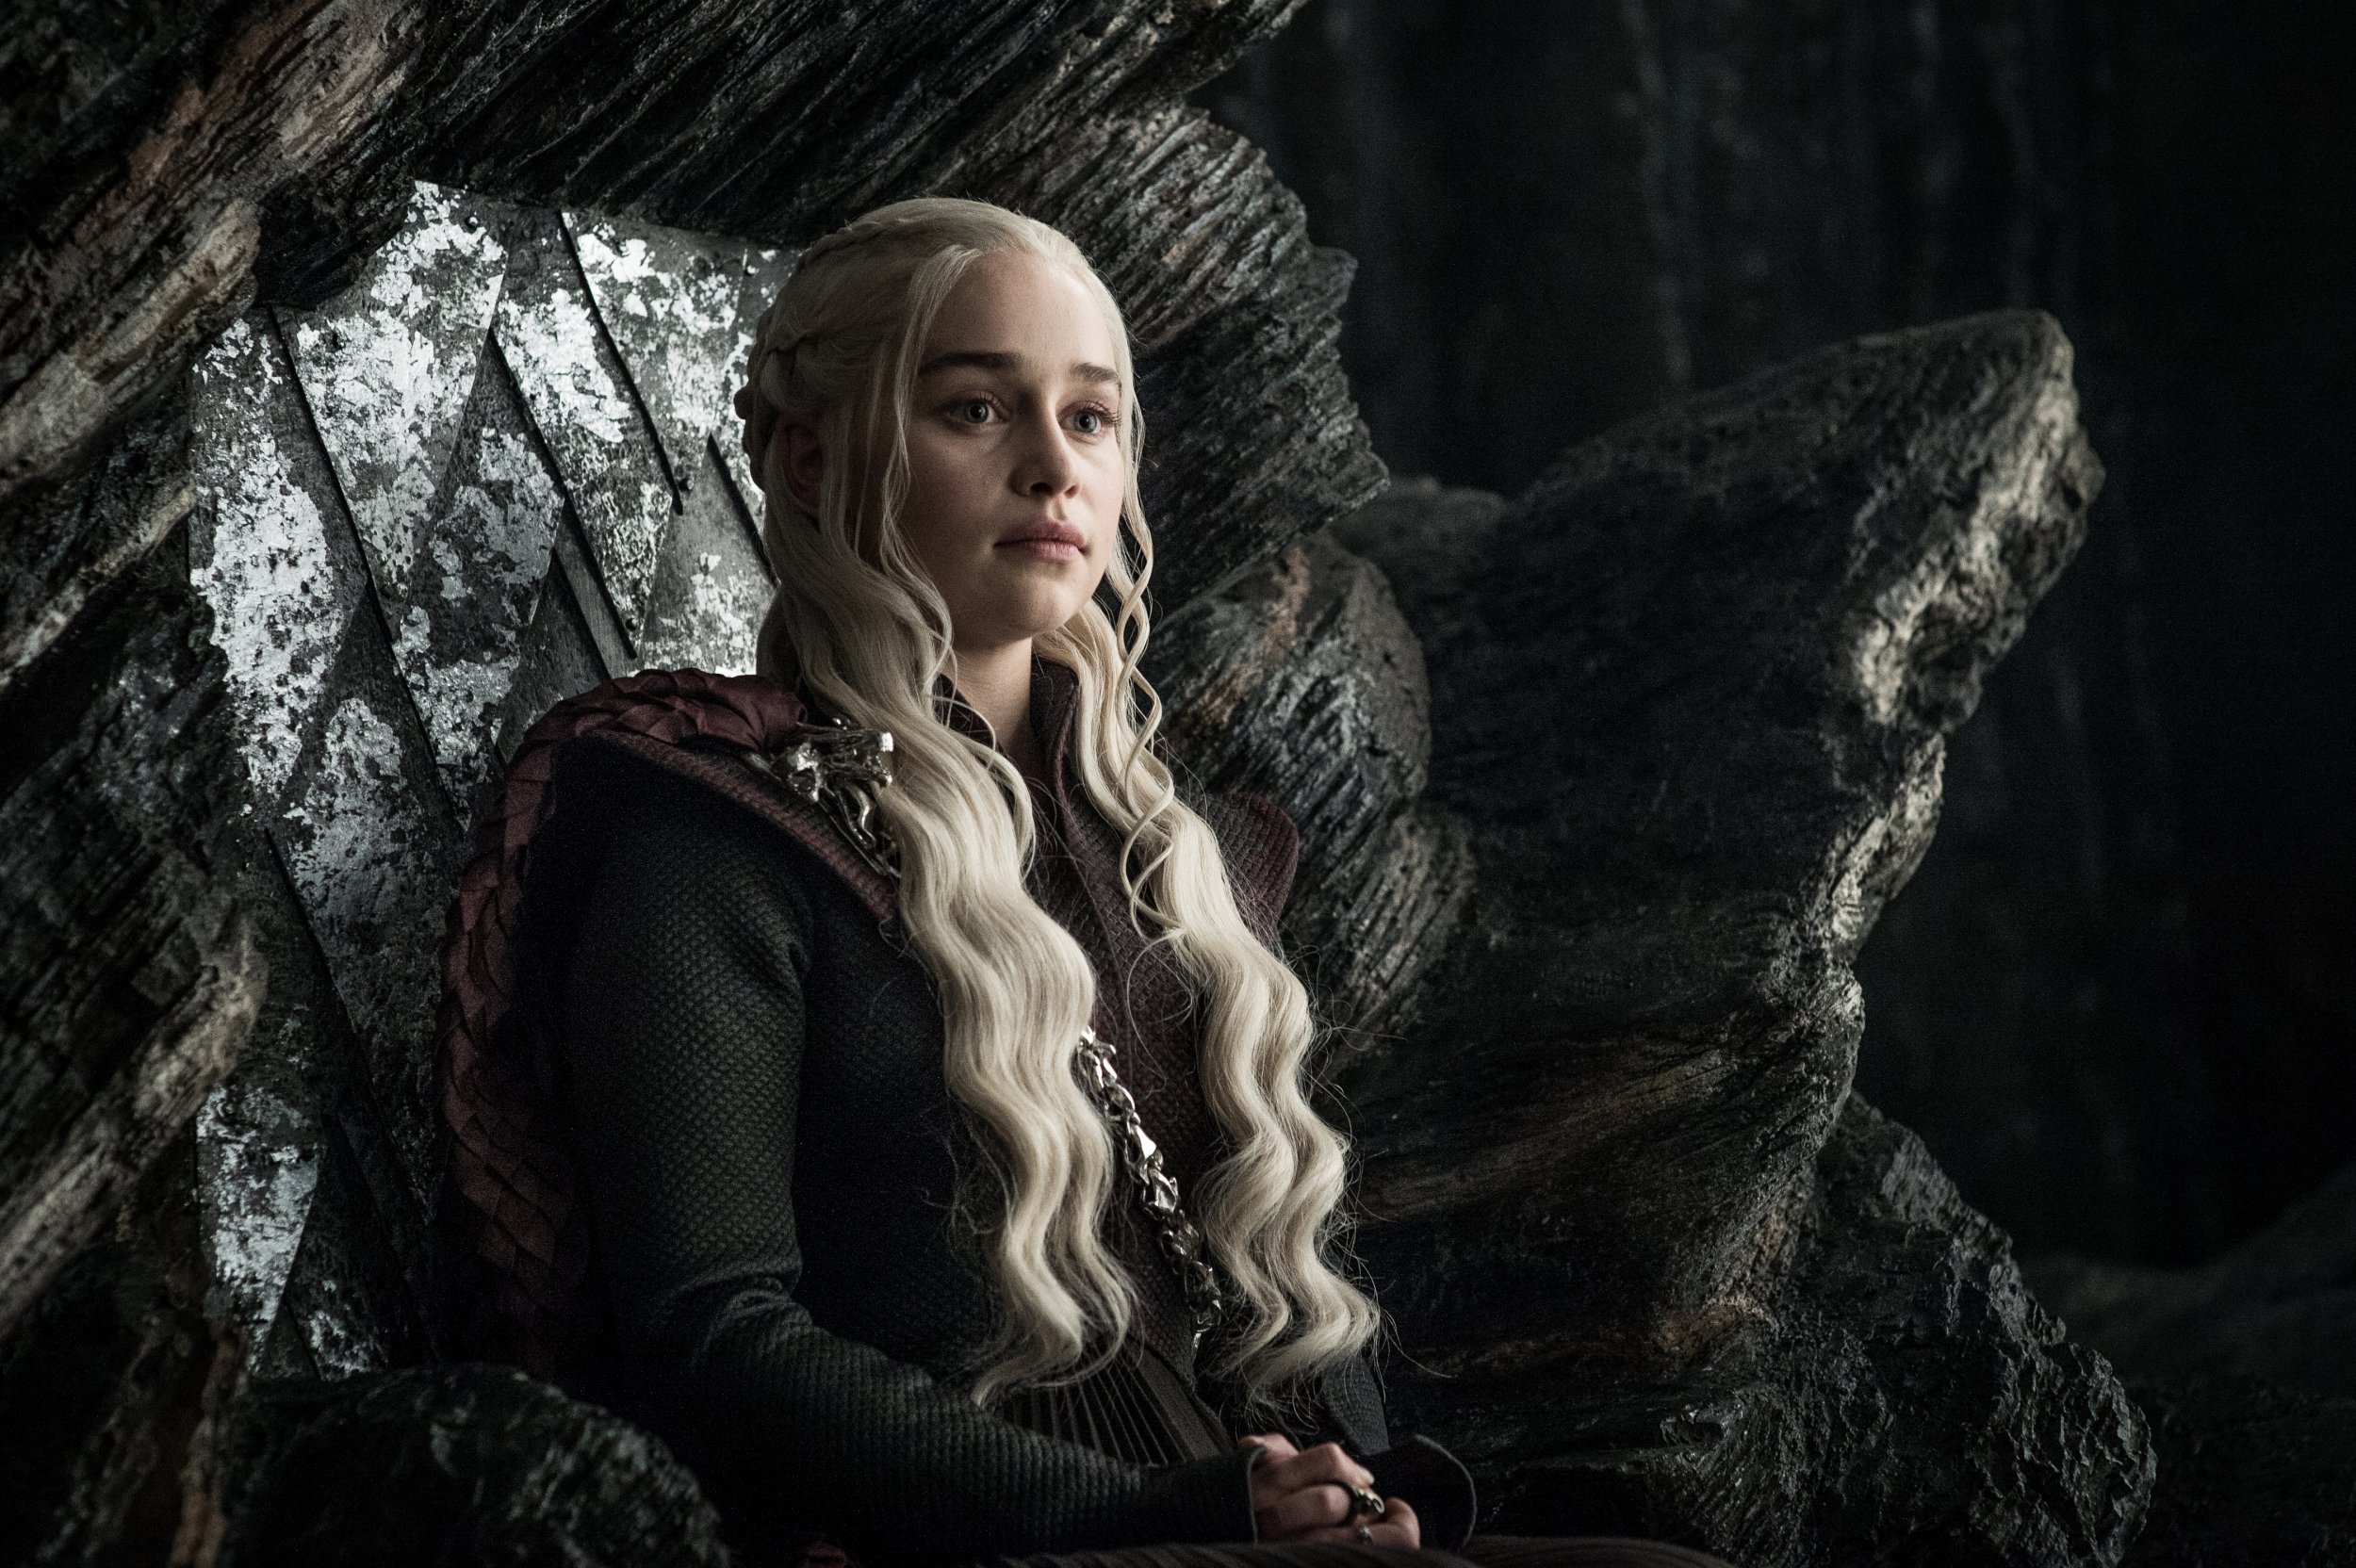 Game Of Thrones star Emilia Clarke thanks Daenerys Targaryen for 'saving my life' after suffering two aneurysms